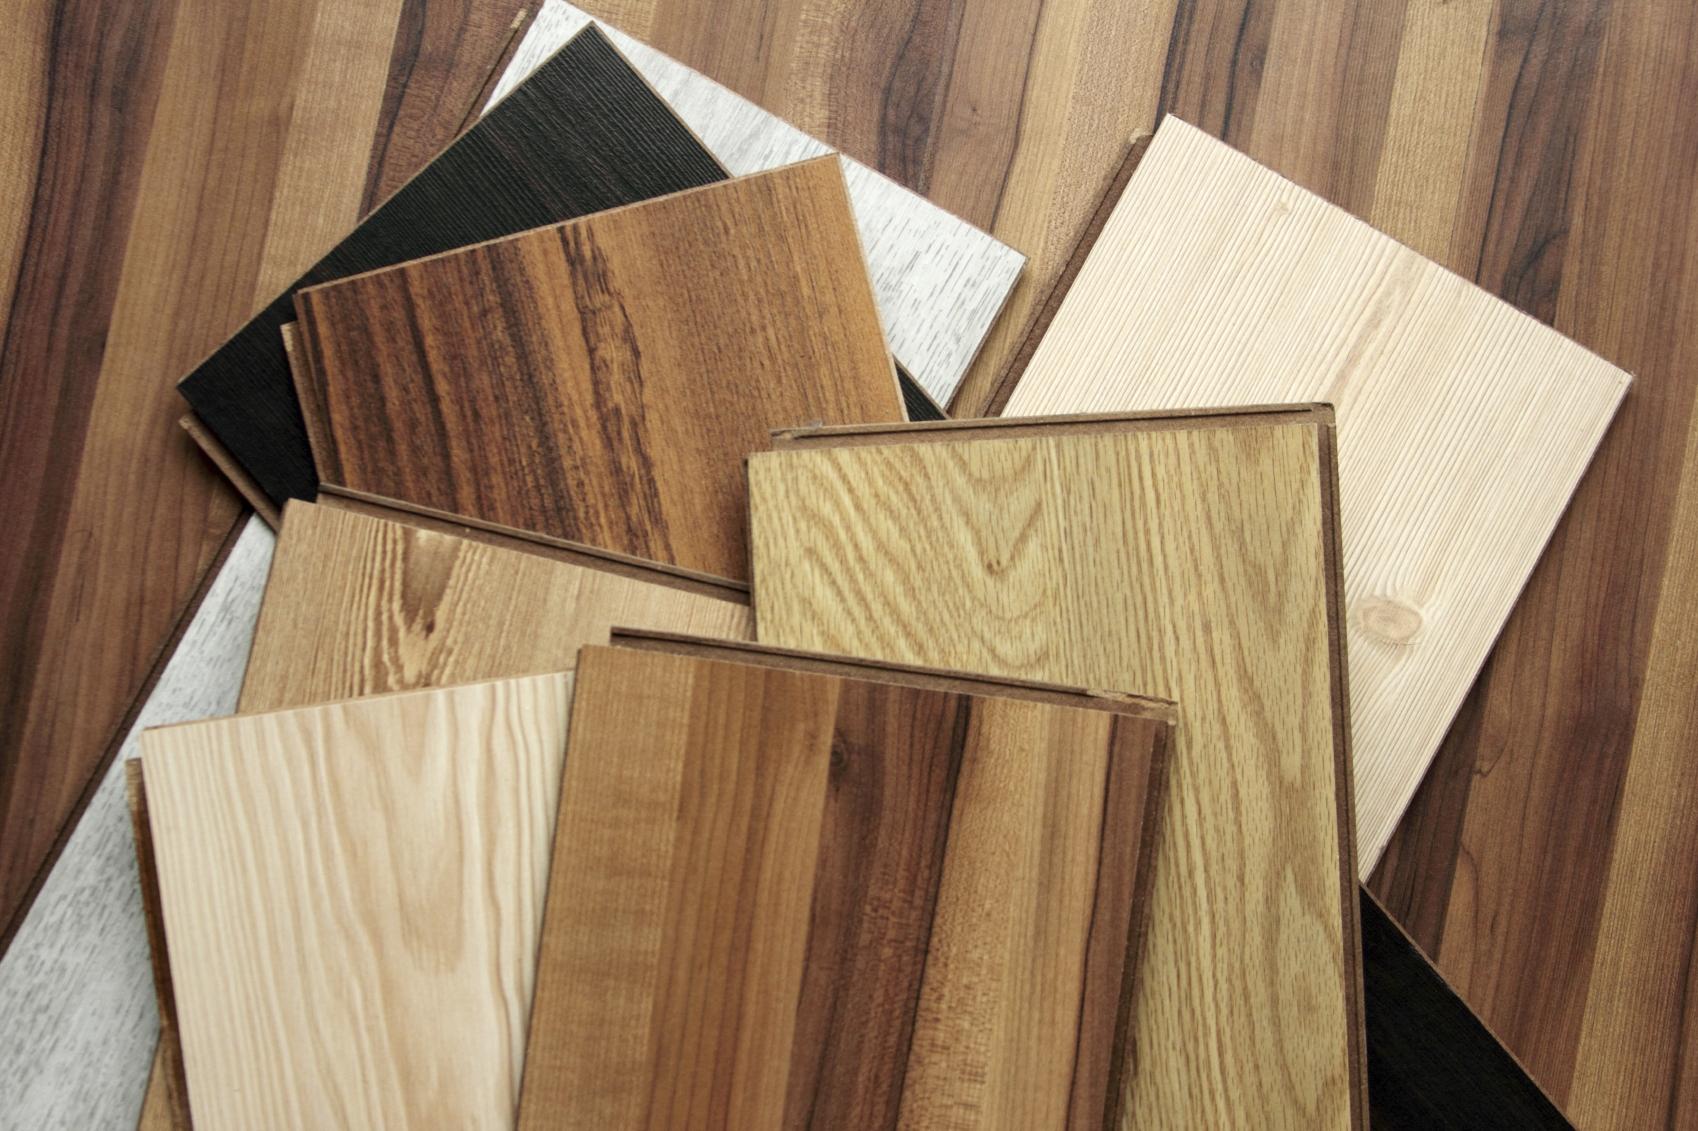 Refinishing hardwood floors alair homes vancouver for Hardwood floors look dull